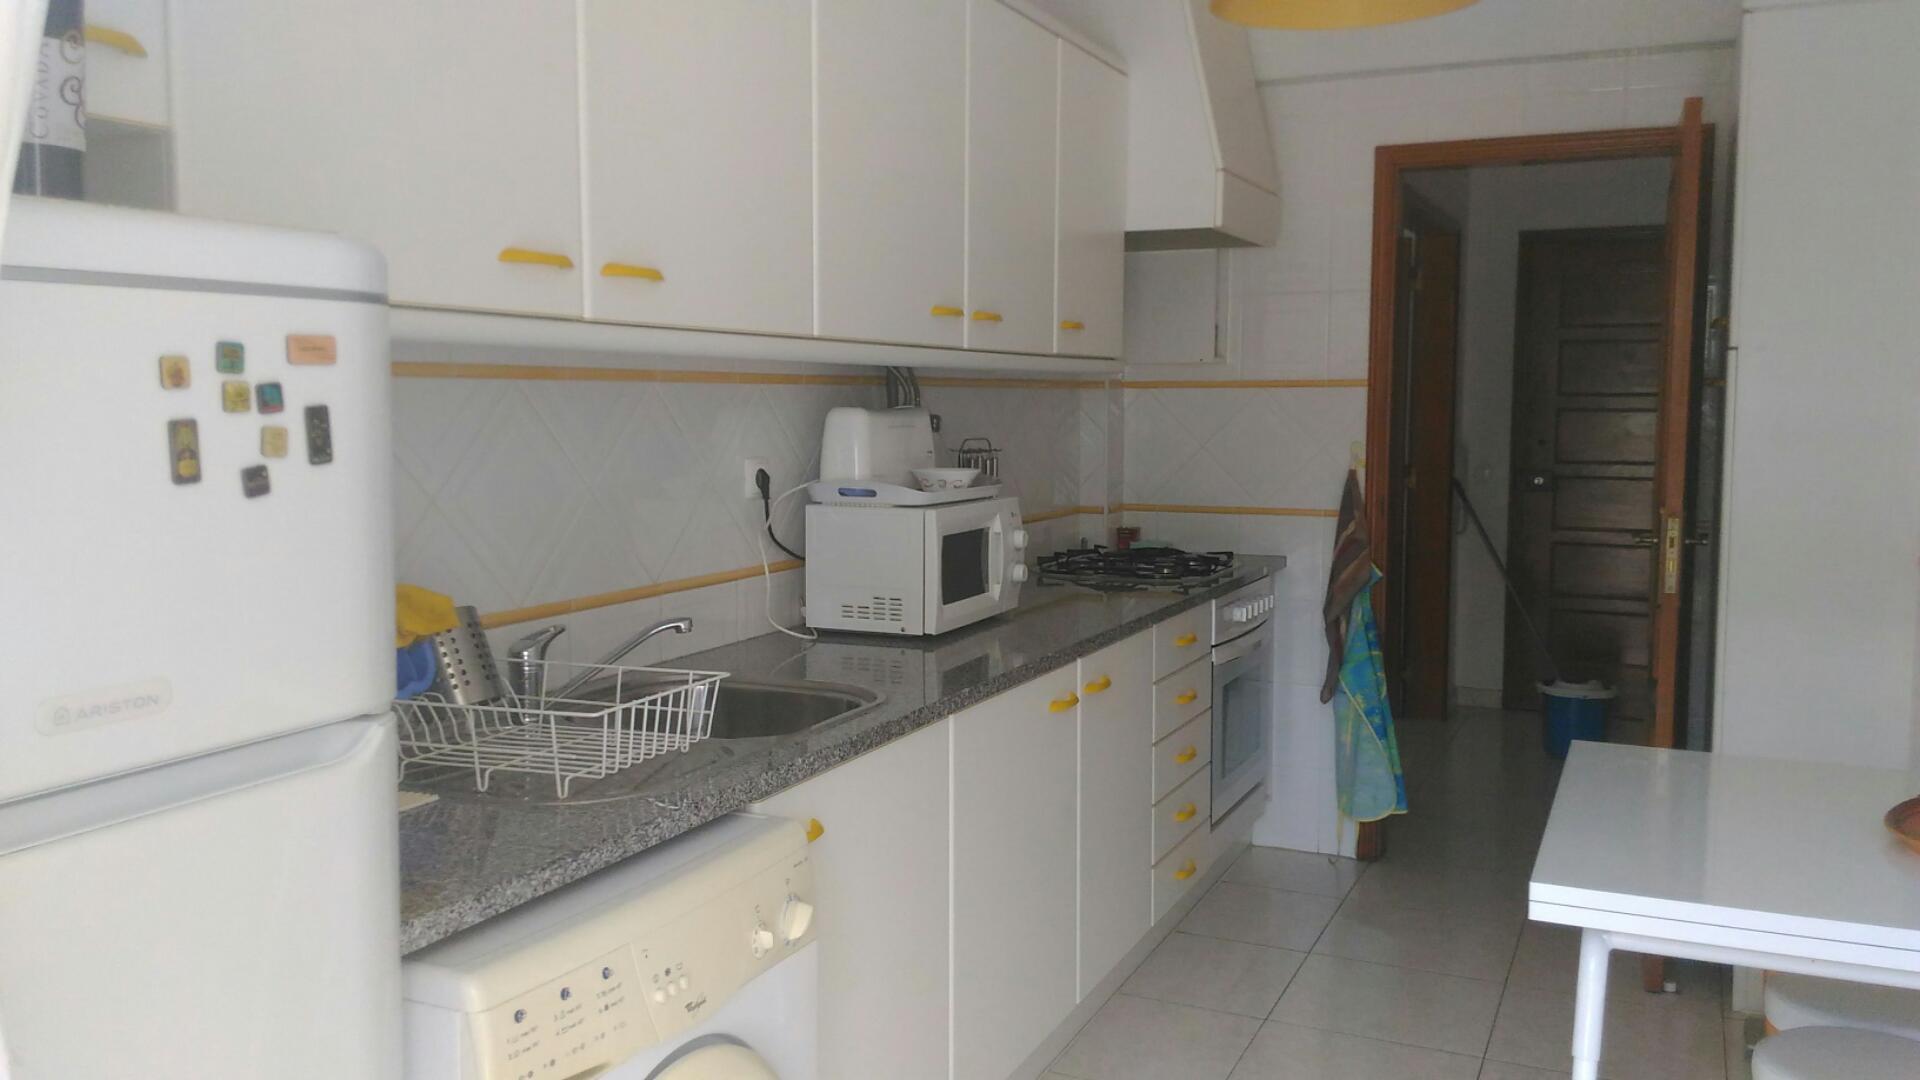 Holiday apartments and villas for rent, T1 Moredo in Armação de Pêra, Portugal Algarve, REF_IMG_8899_8901